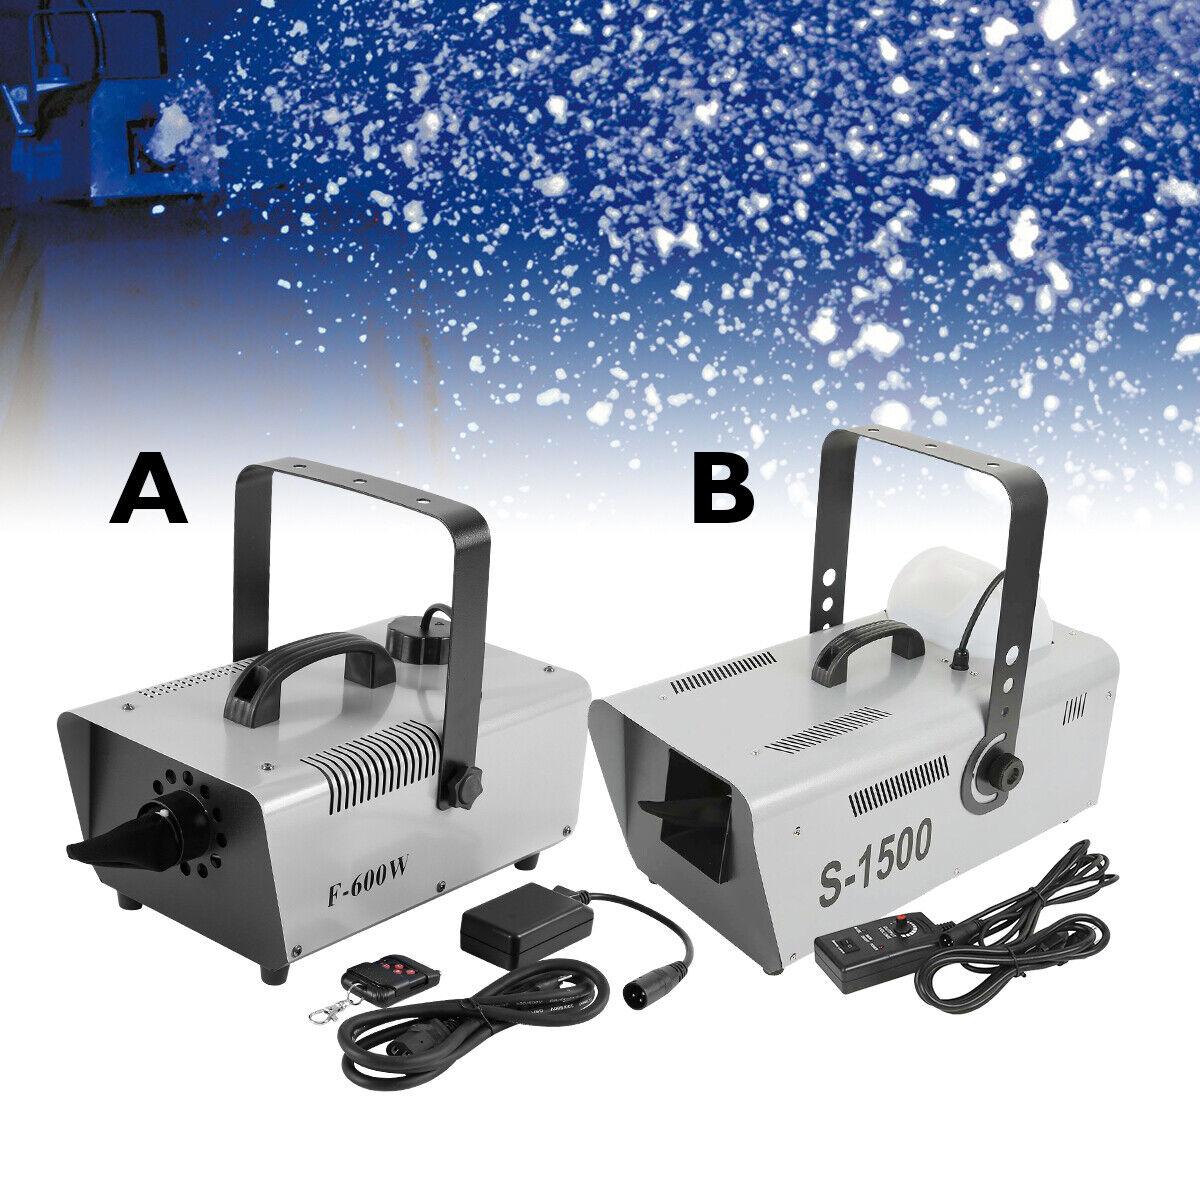 Portable 600W /1500W Snowflake Machine Snow Maker Spraying Show Stage Remote